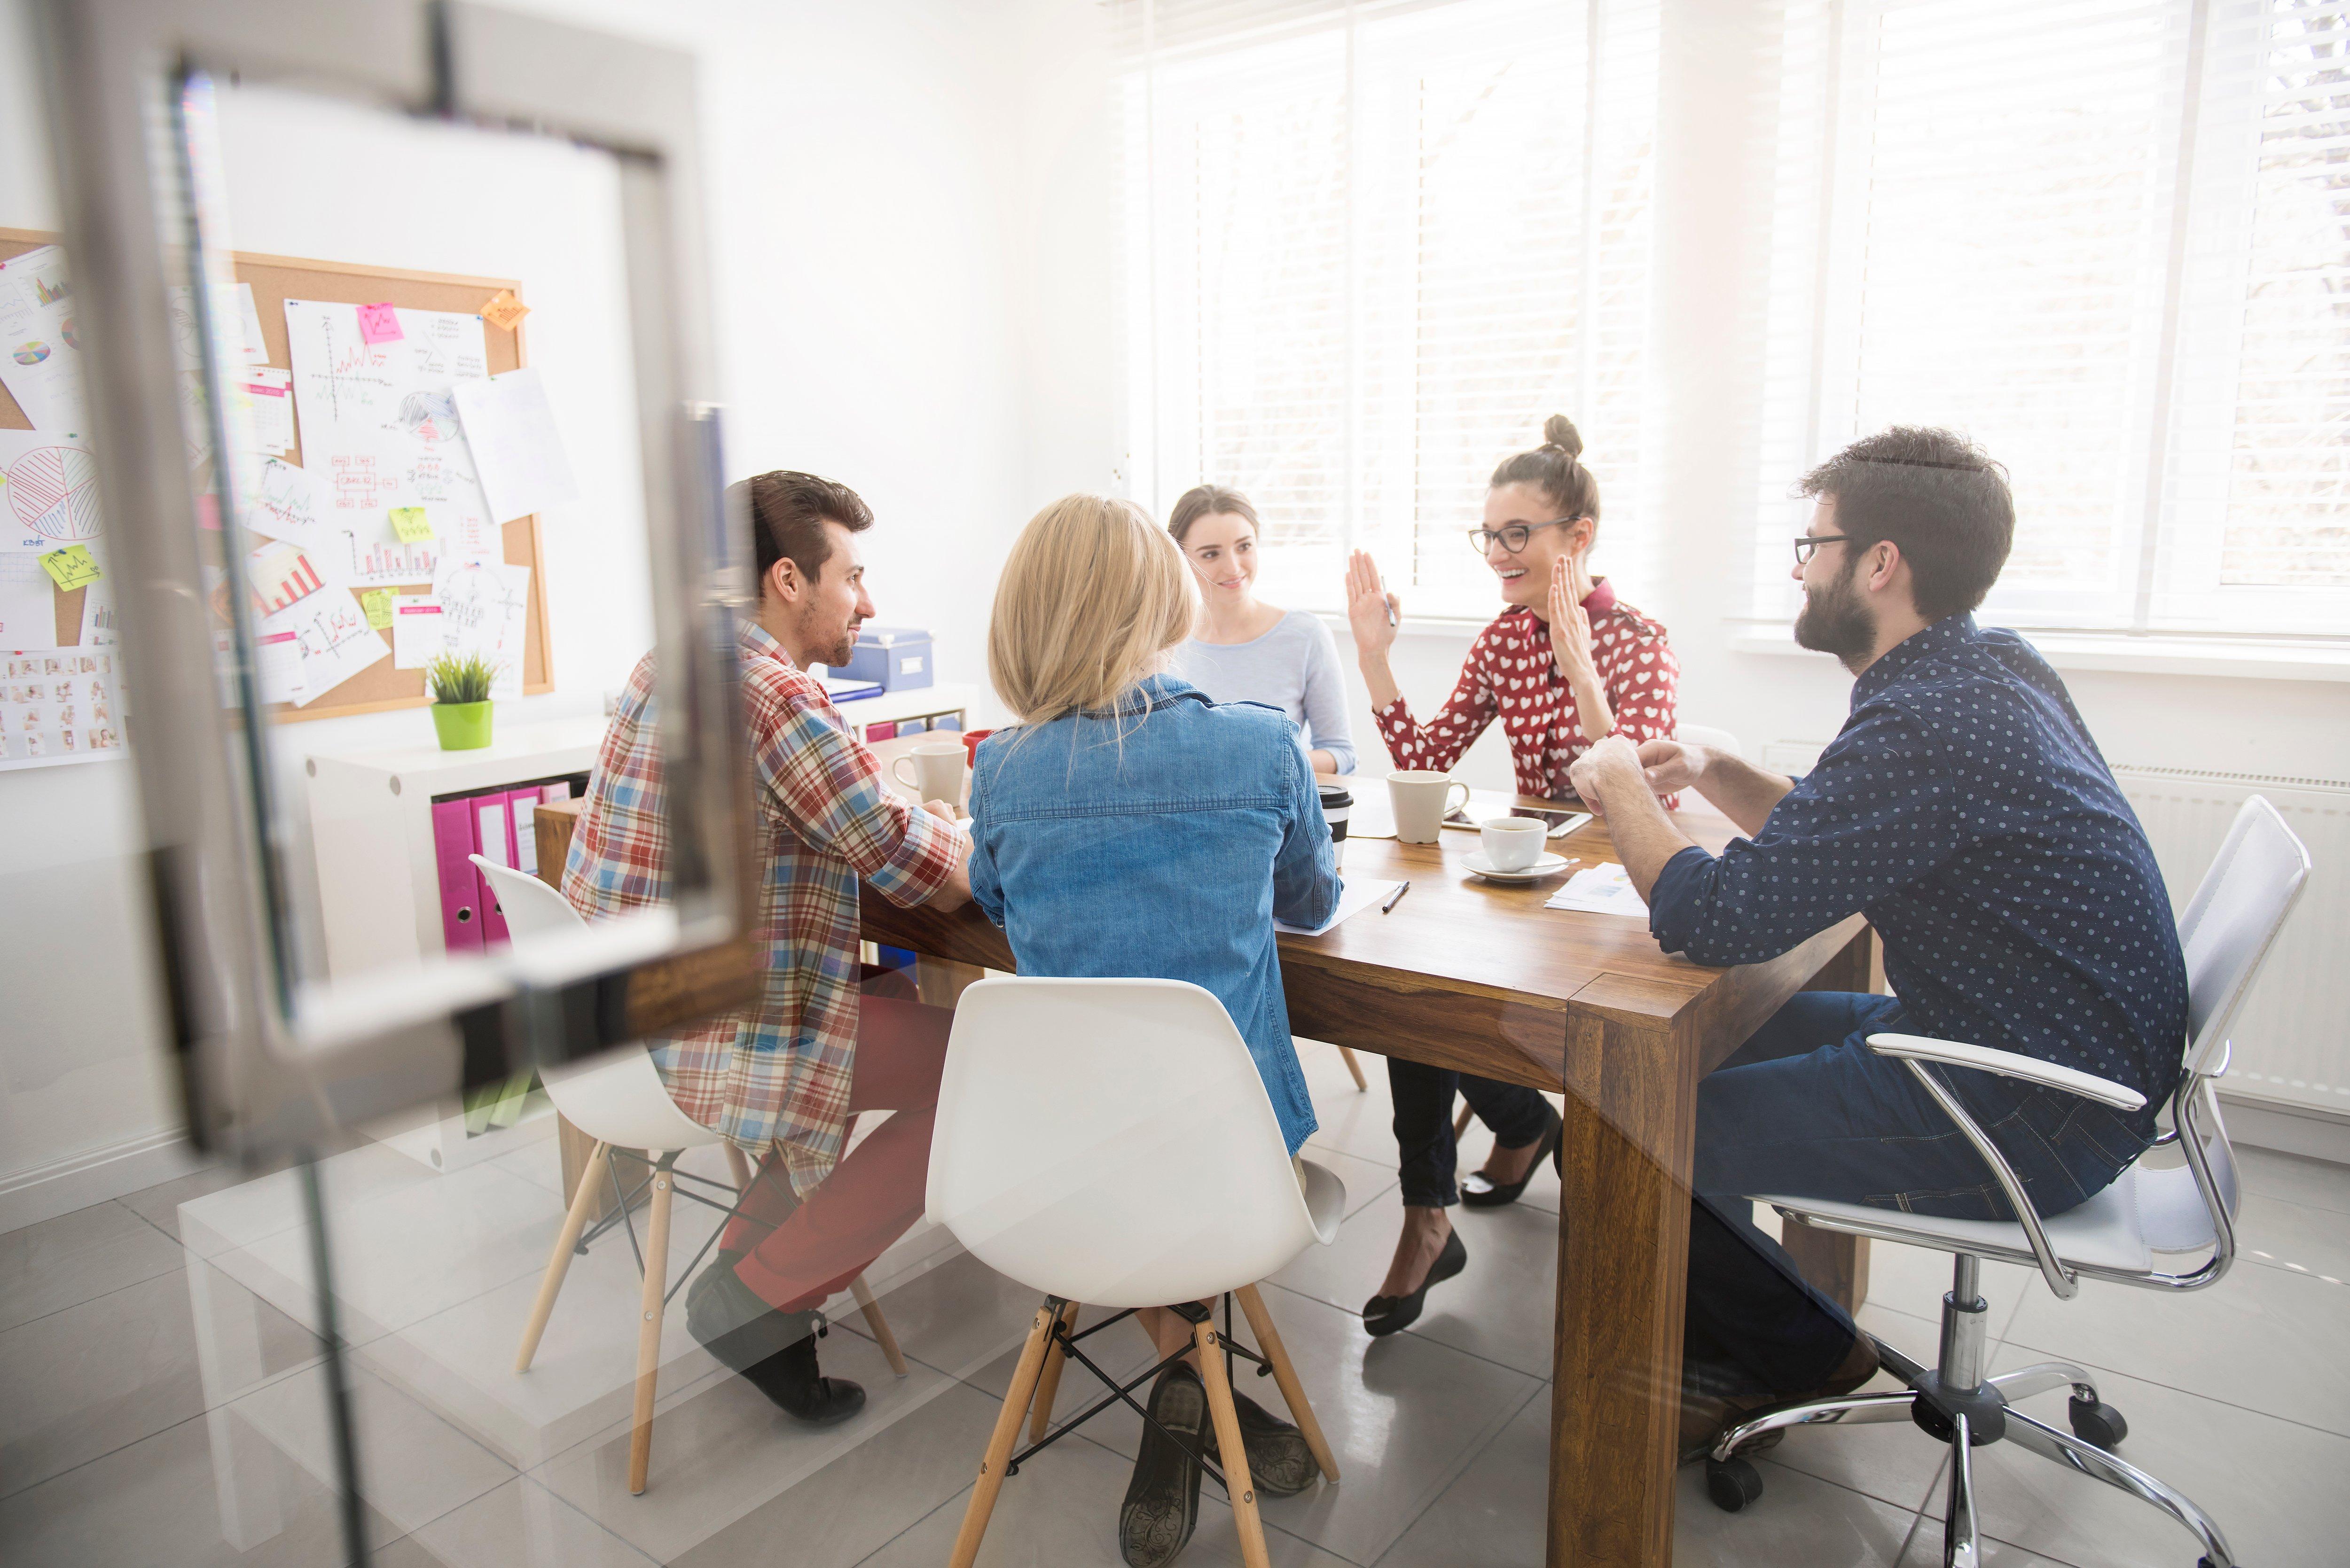 coworkers-team-working-brainstorming-concept